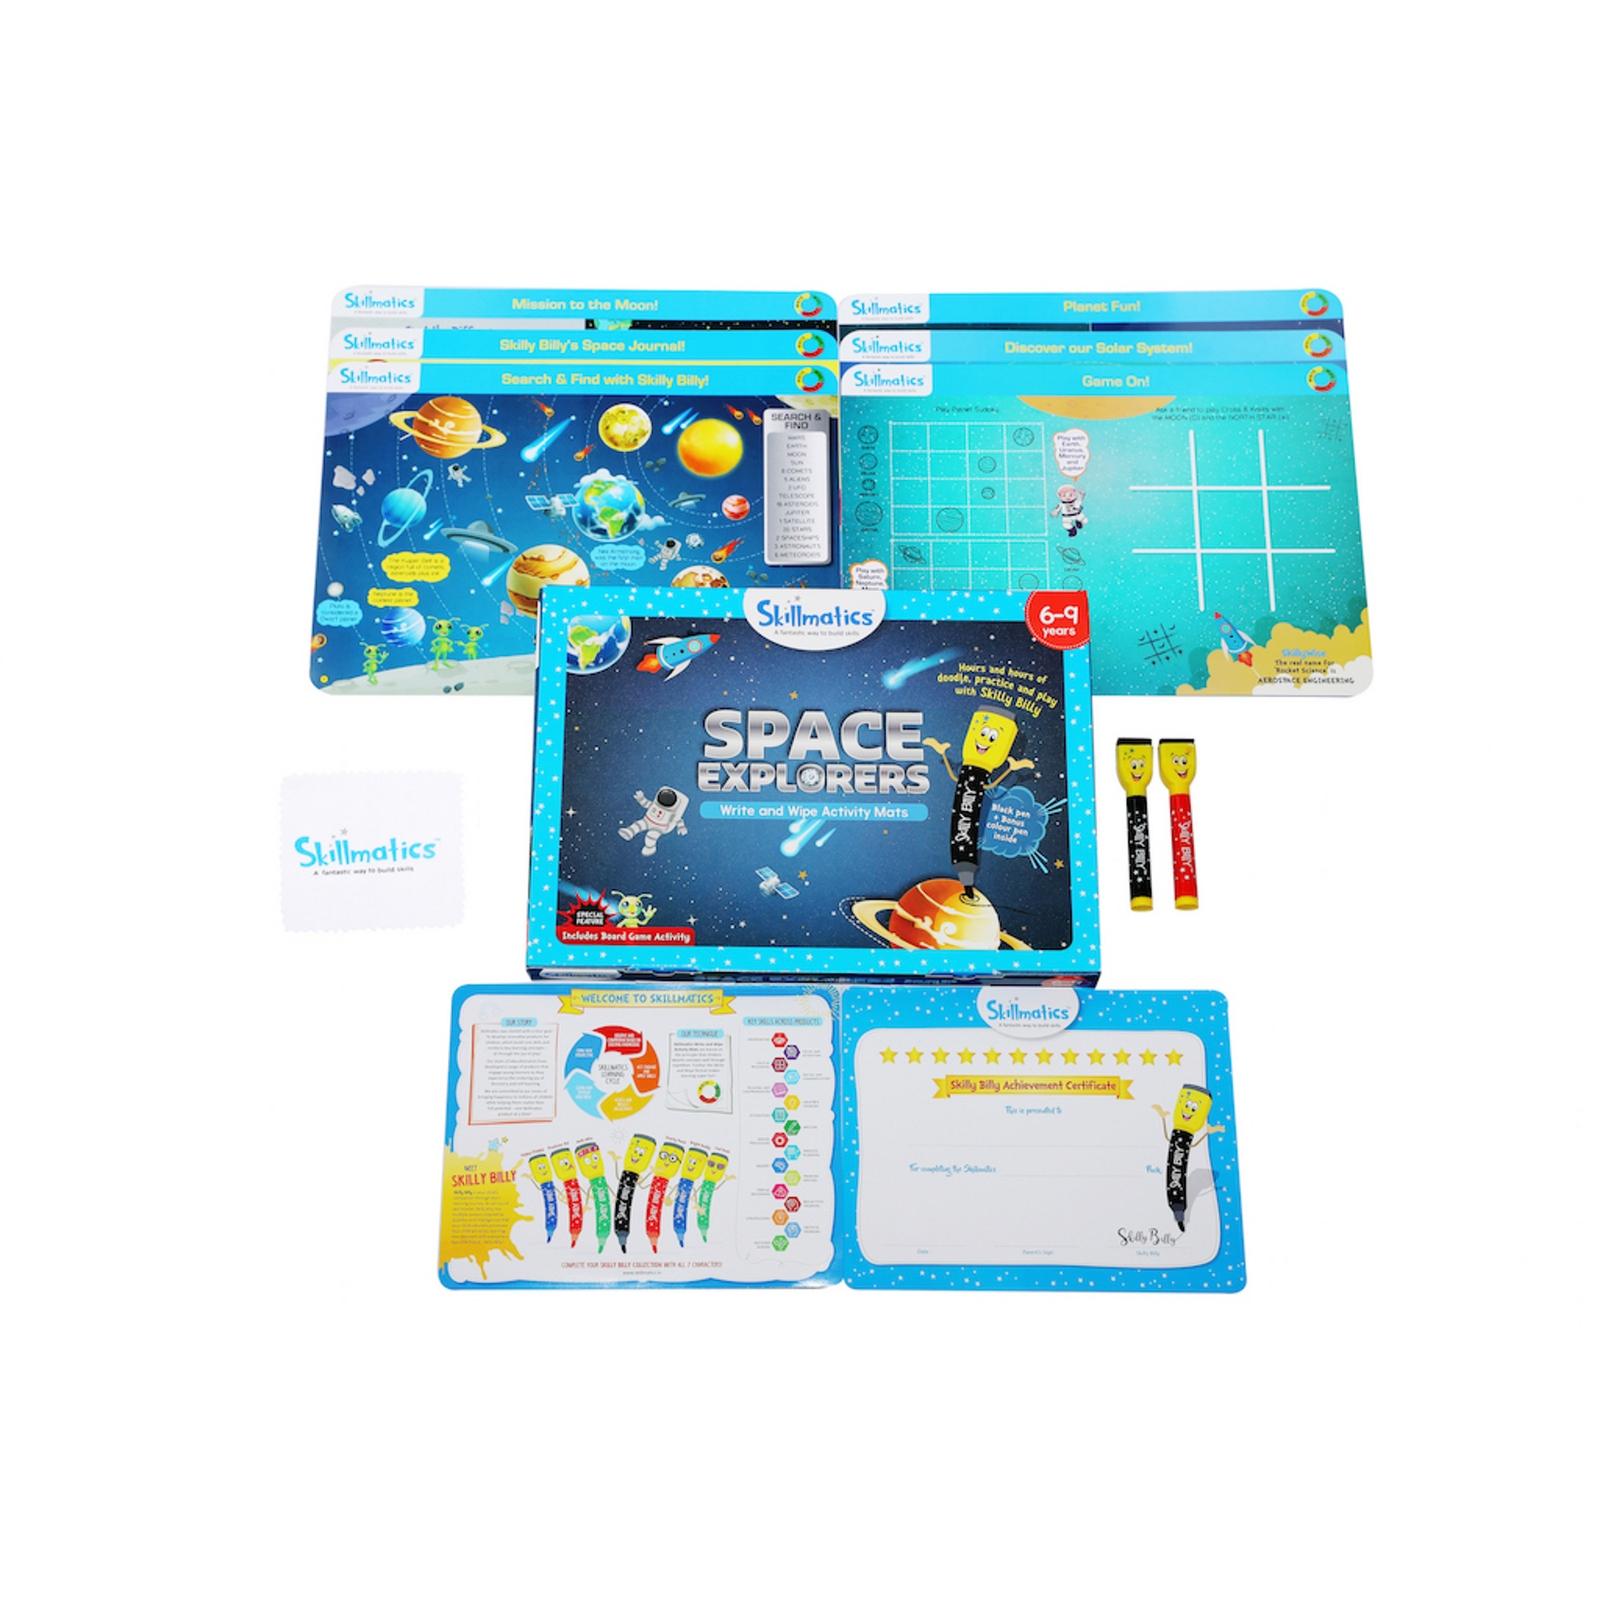 Skillmatics Range - Space Explorers